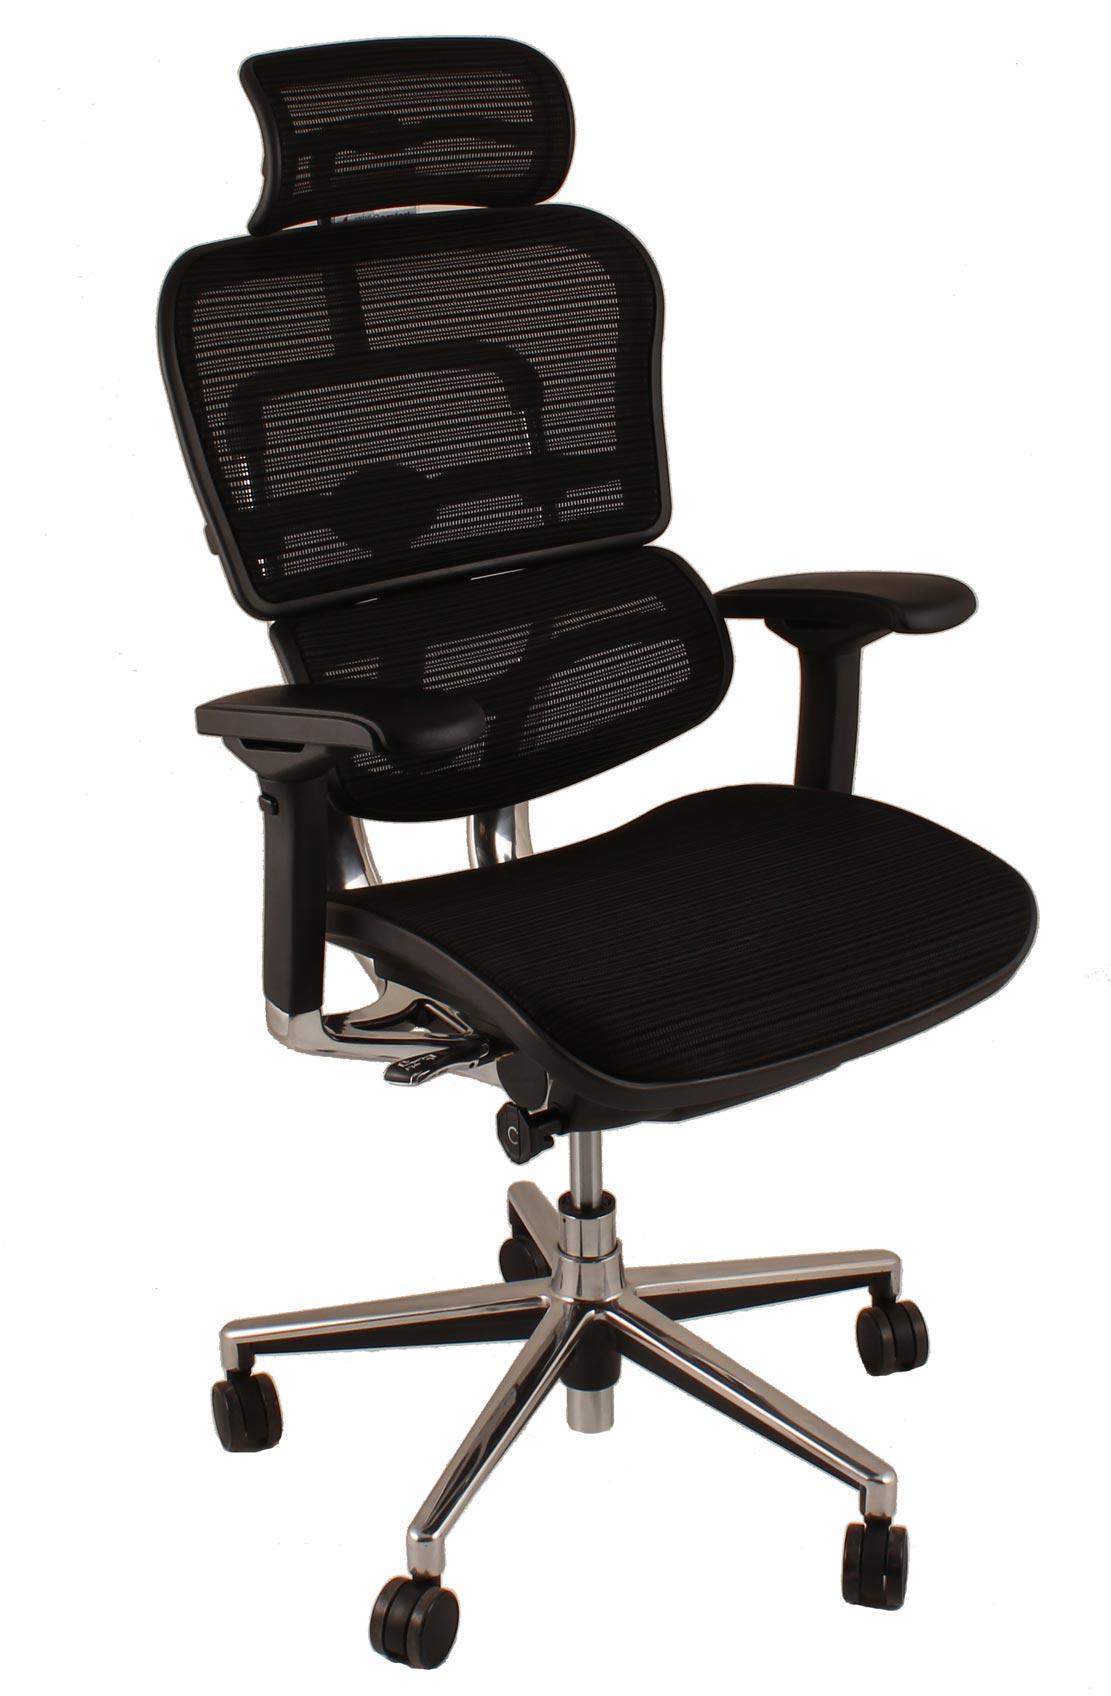 lightbox  sc 1 st  Margolis Furniture & Ergohuman Office Chairs | Ergohuman Chairs | Margolis Furniture